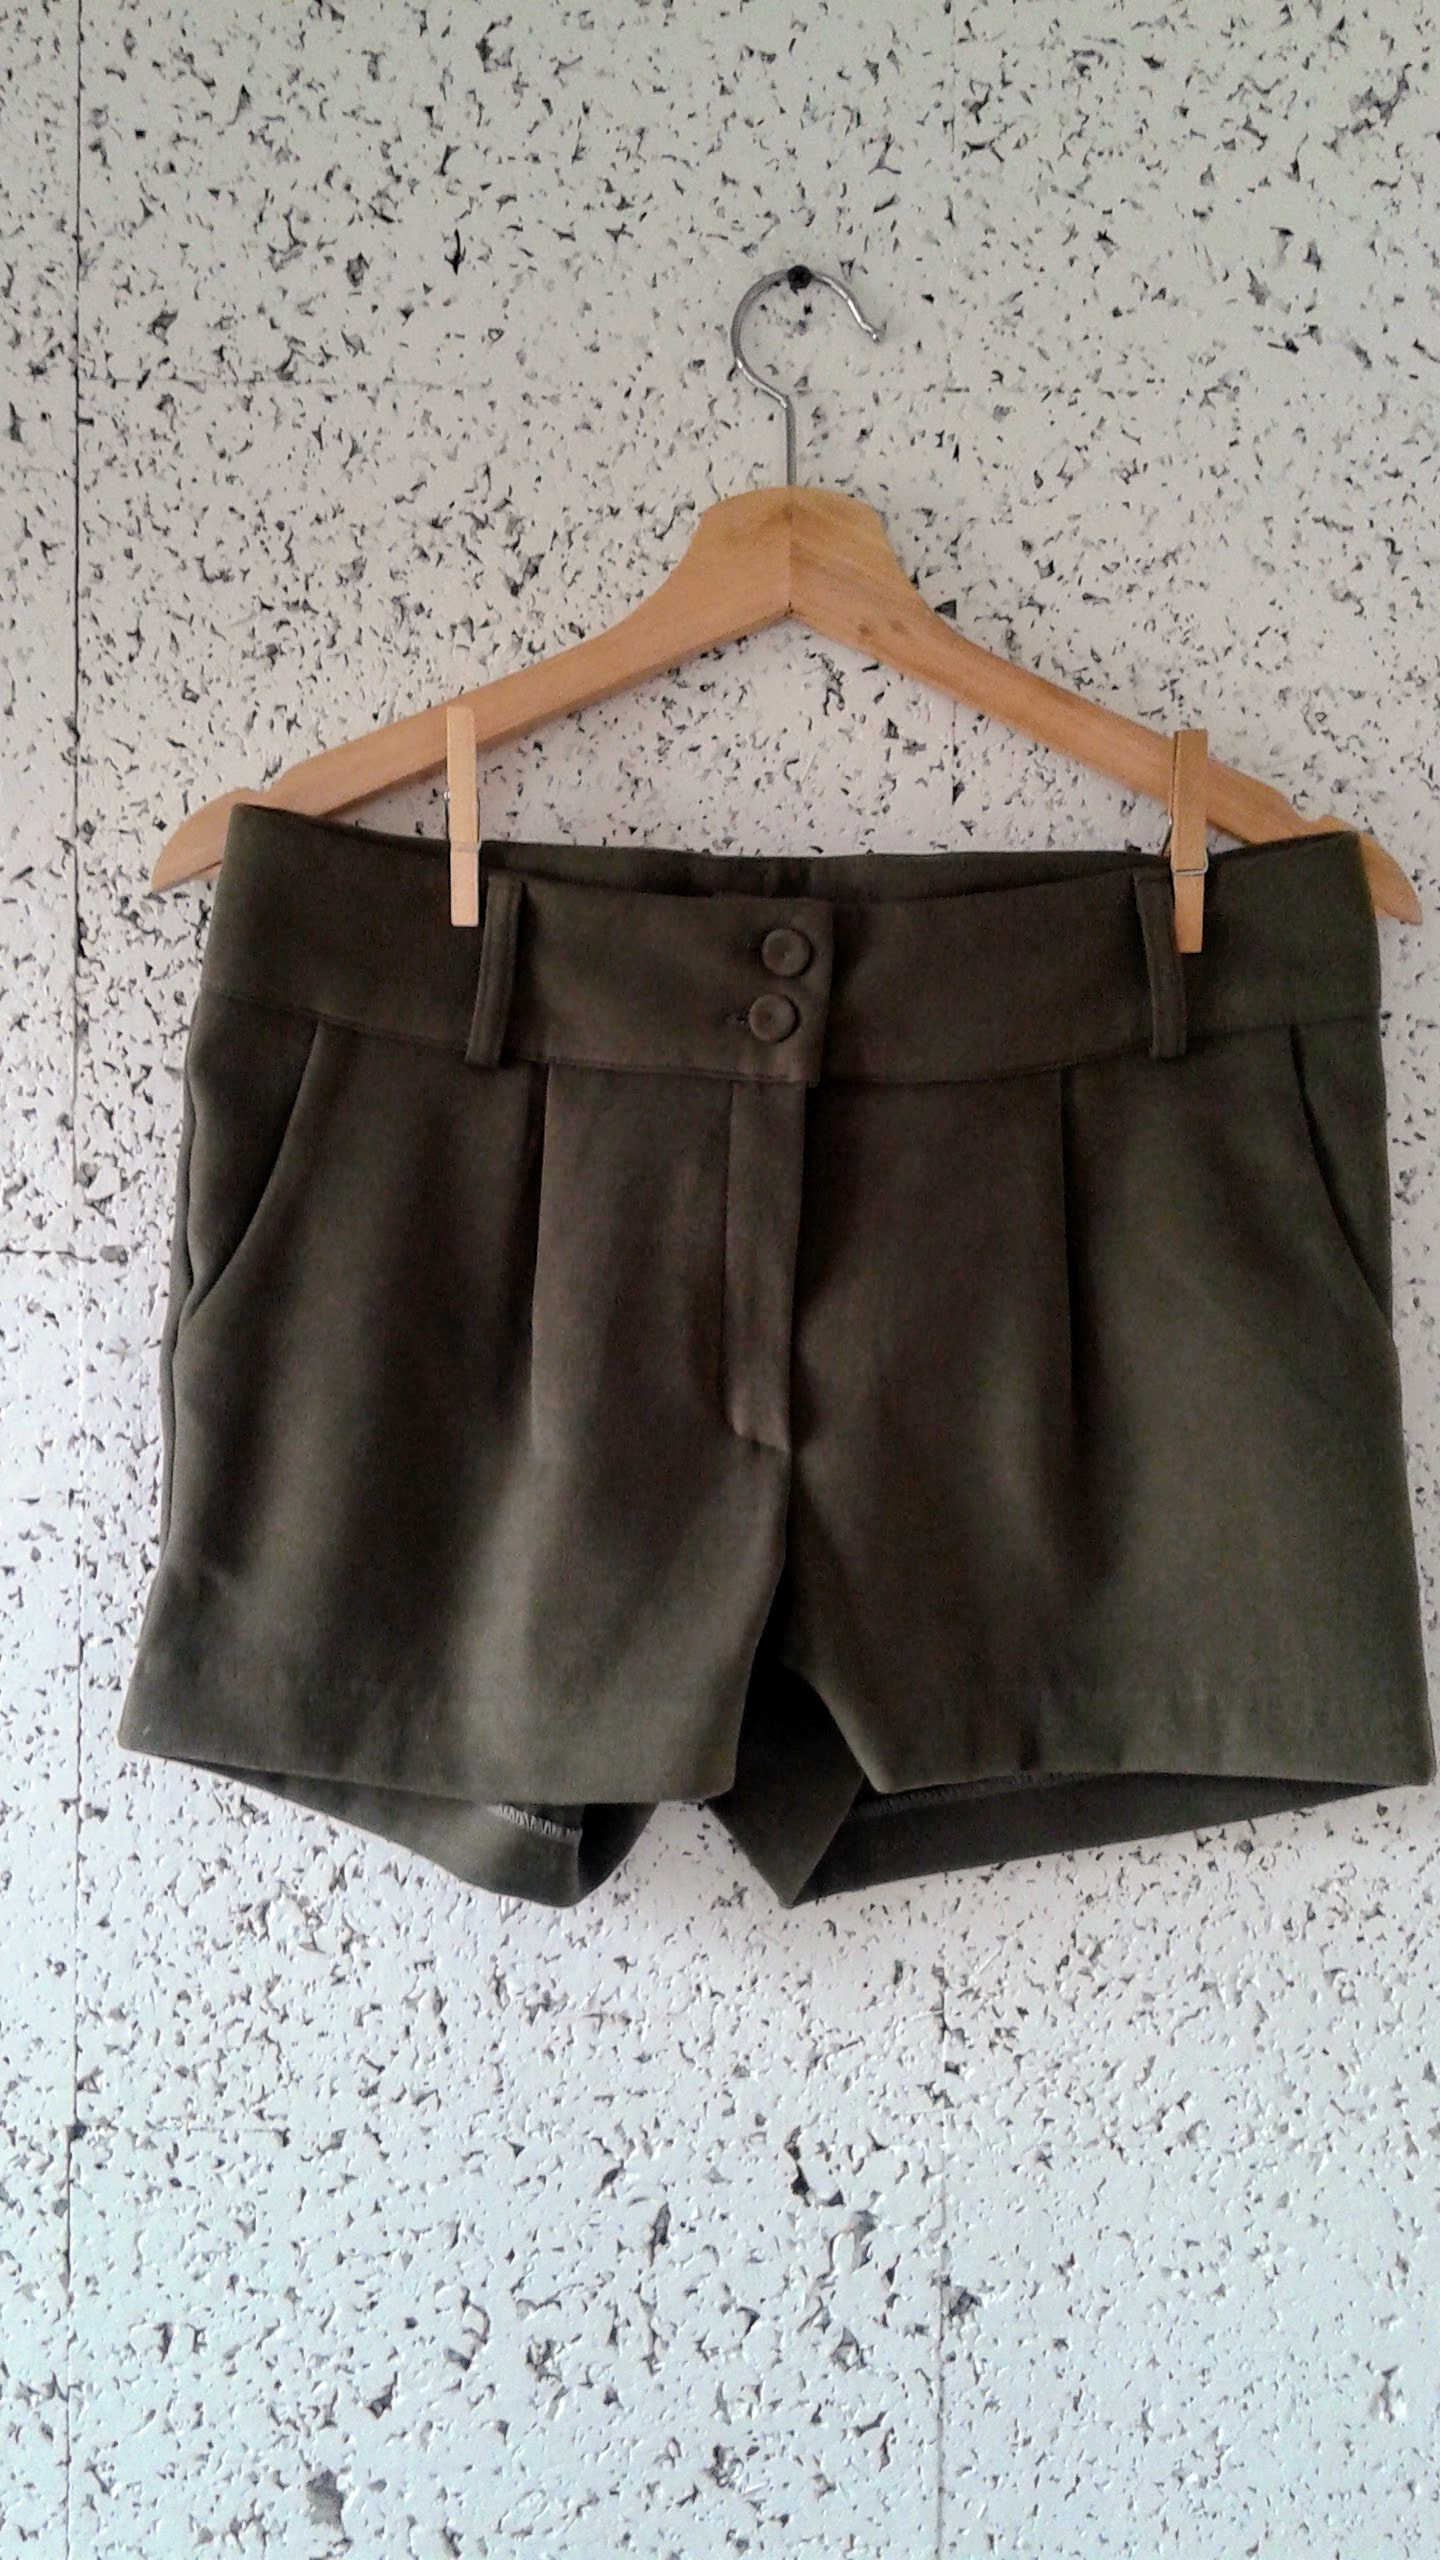 Loft 82 shorts; Size 28, $28